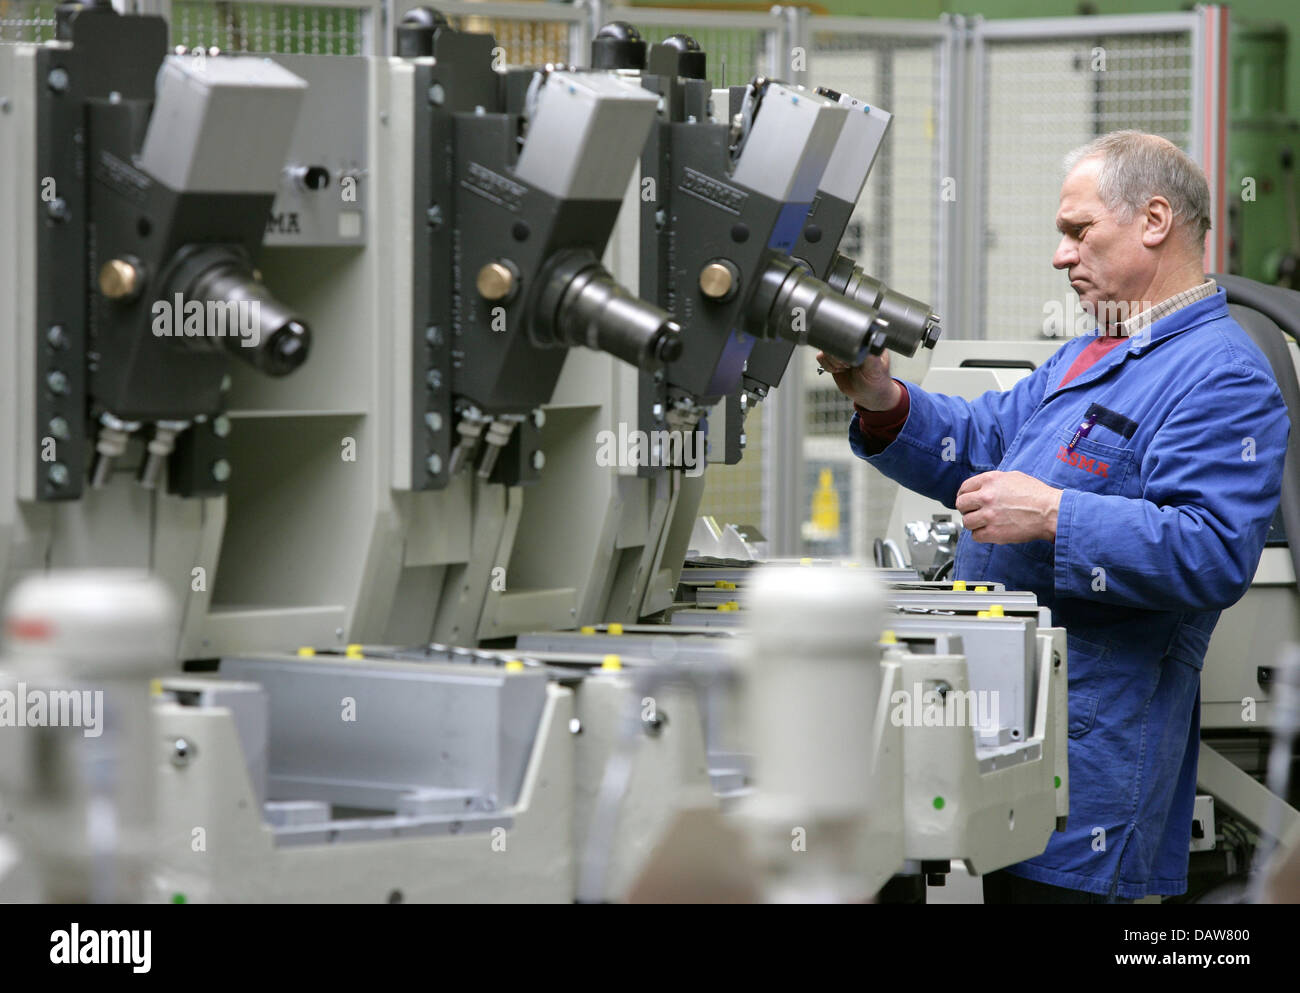 An employee of Kloeckner-Desma shoe-machine producer is